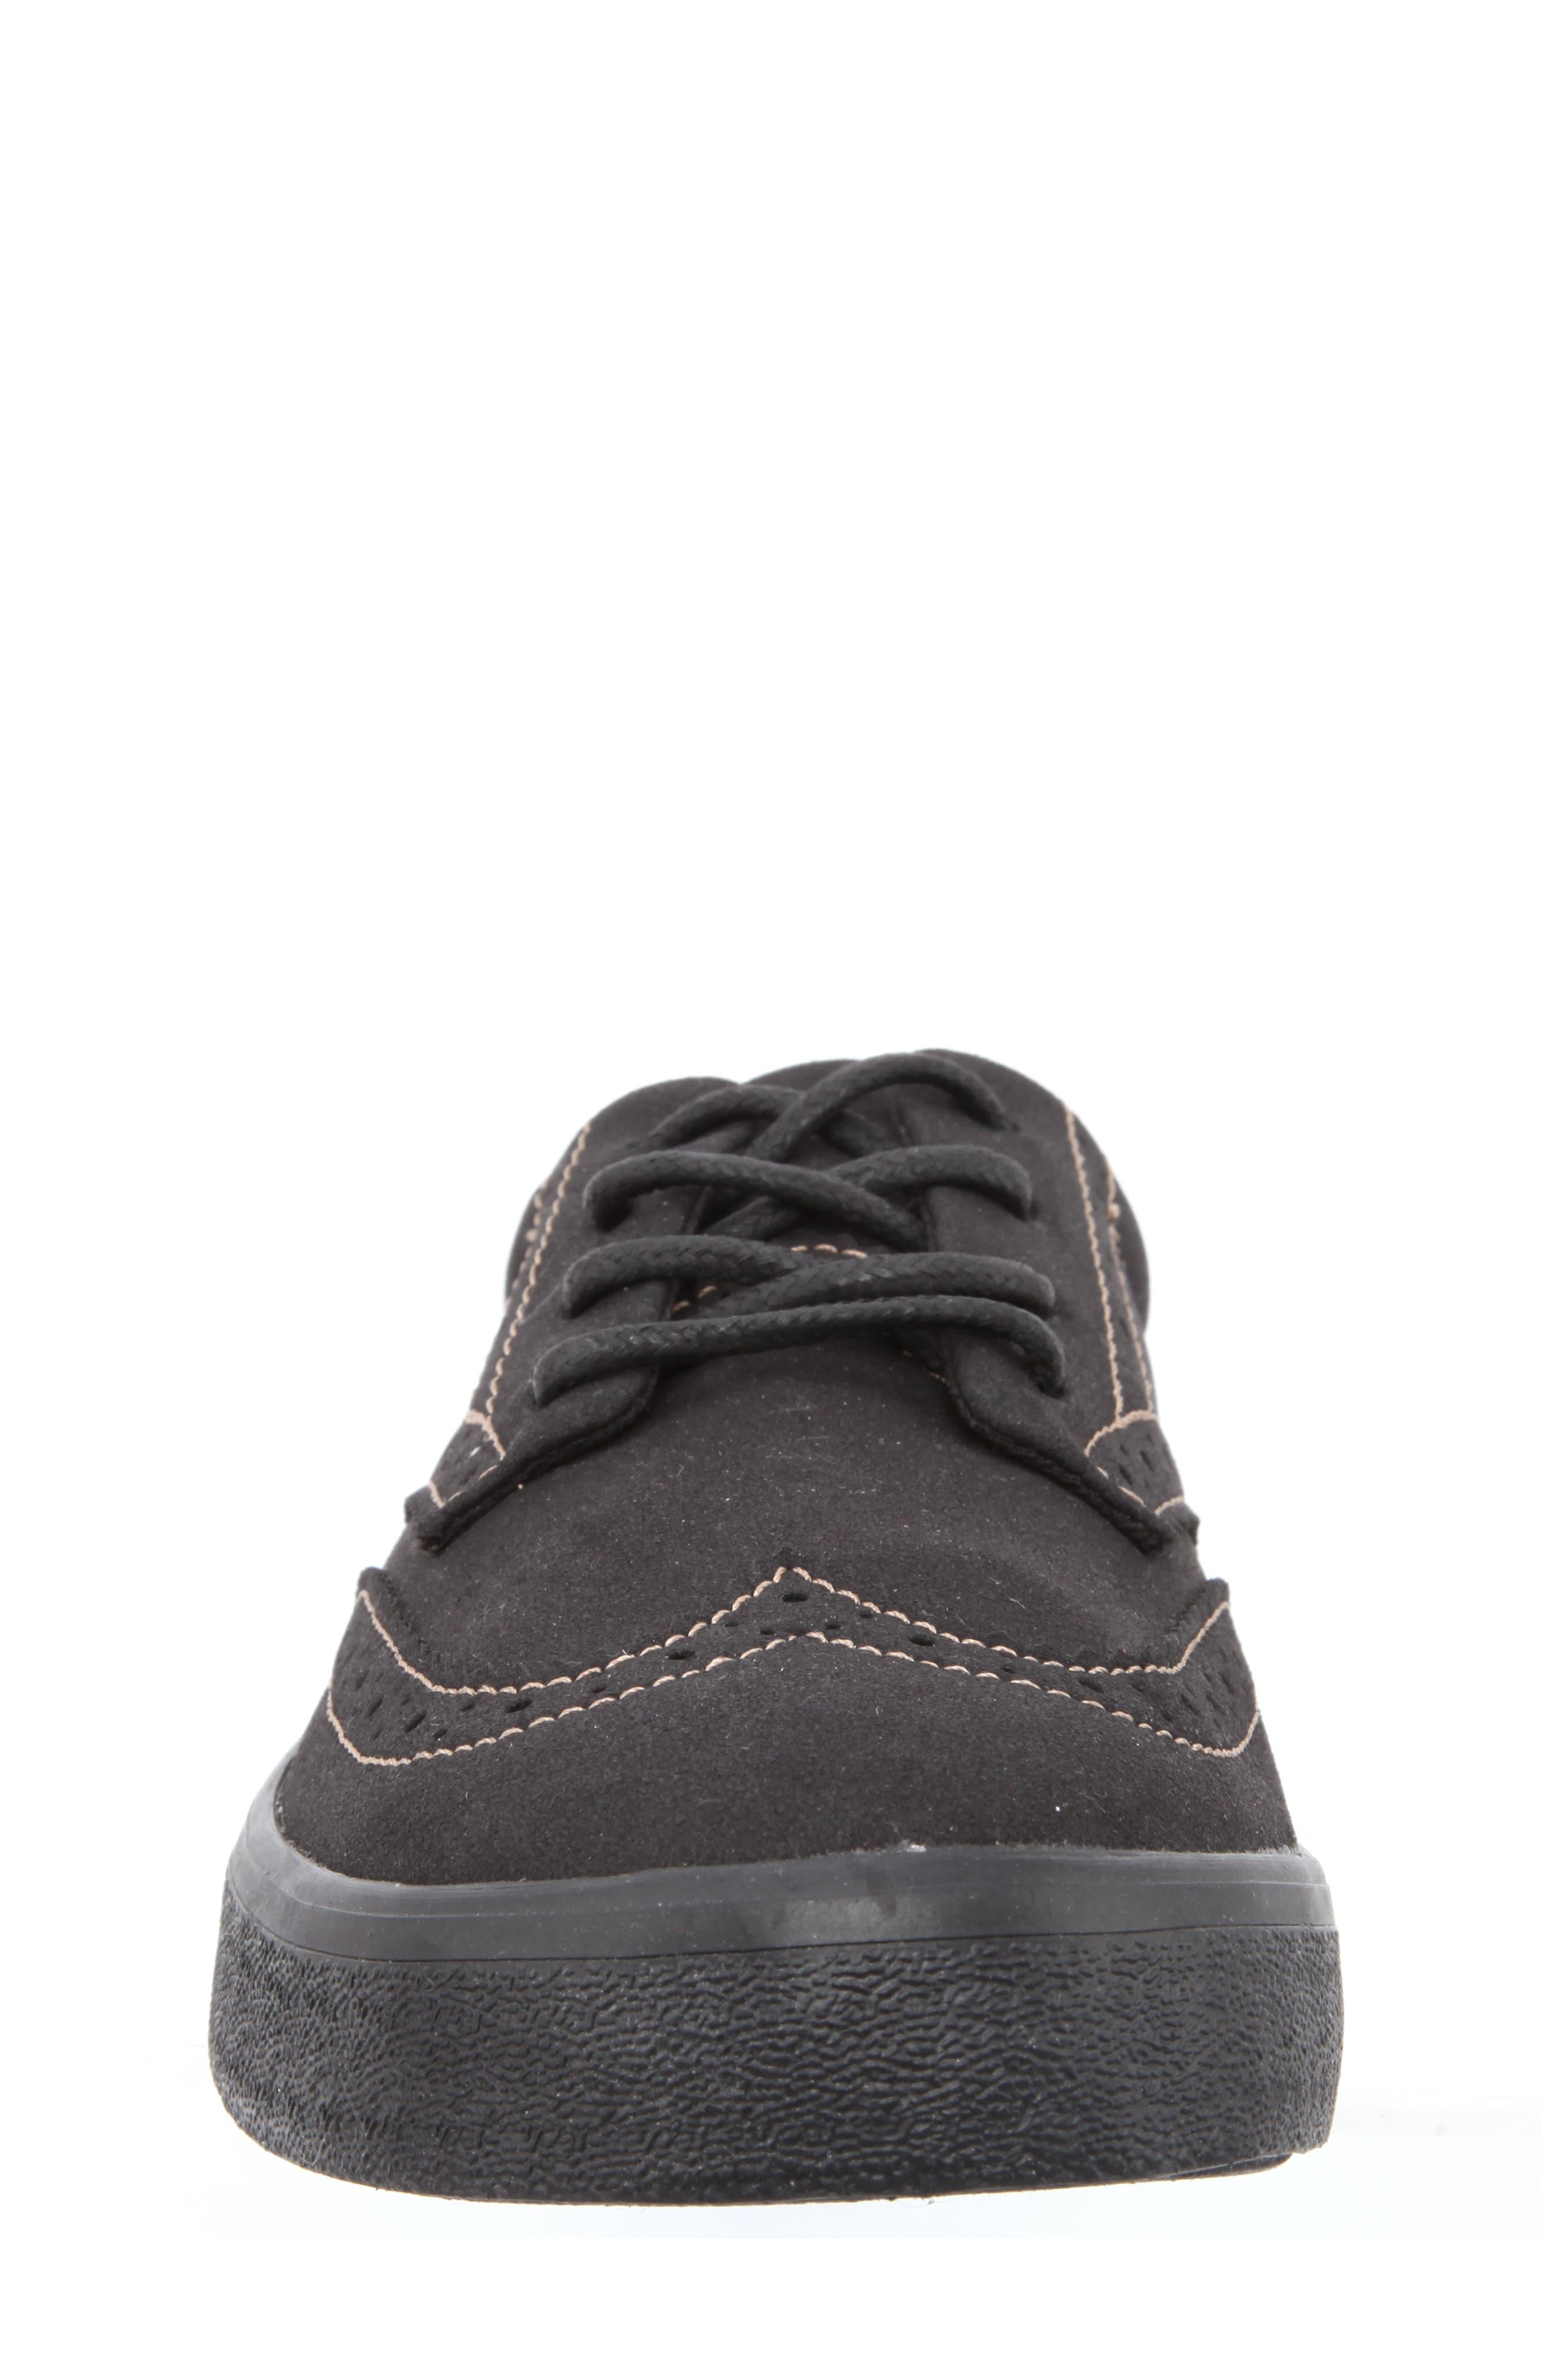 Wingtip Sneaker,                             Alternate thumbnail 10, color,